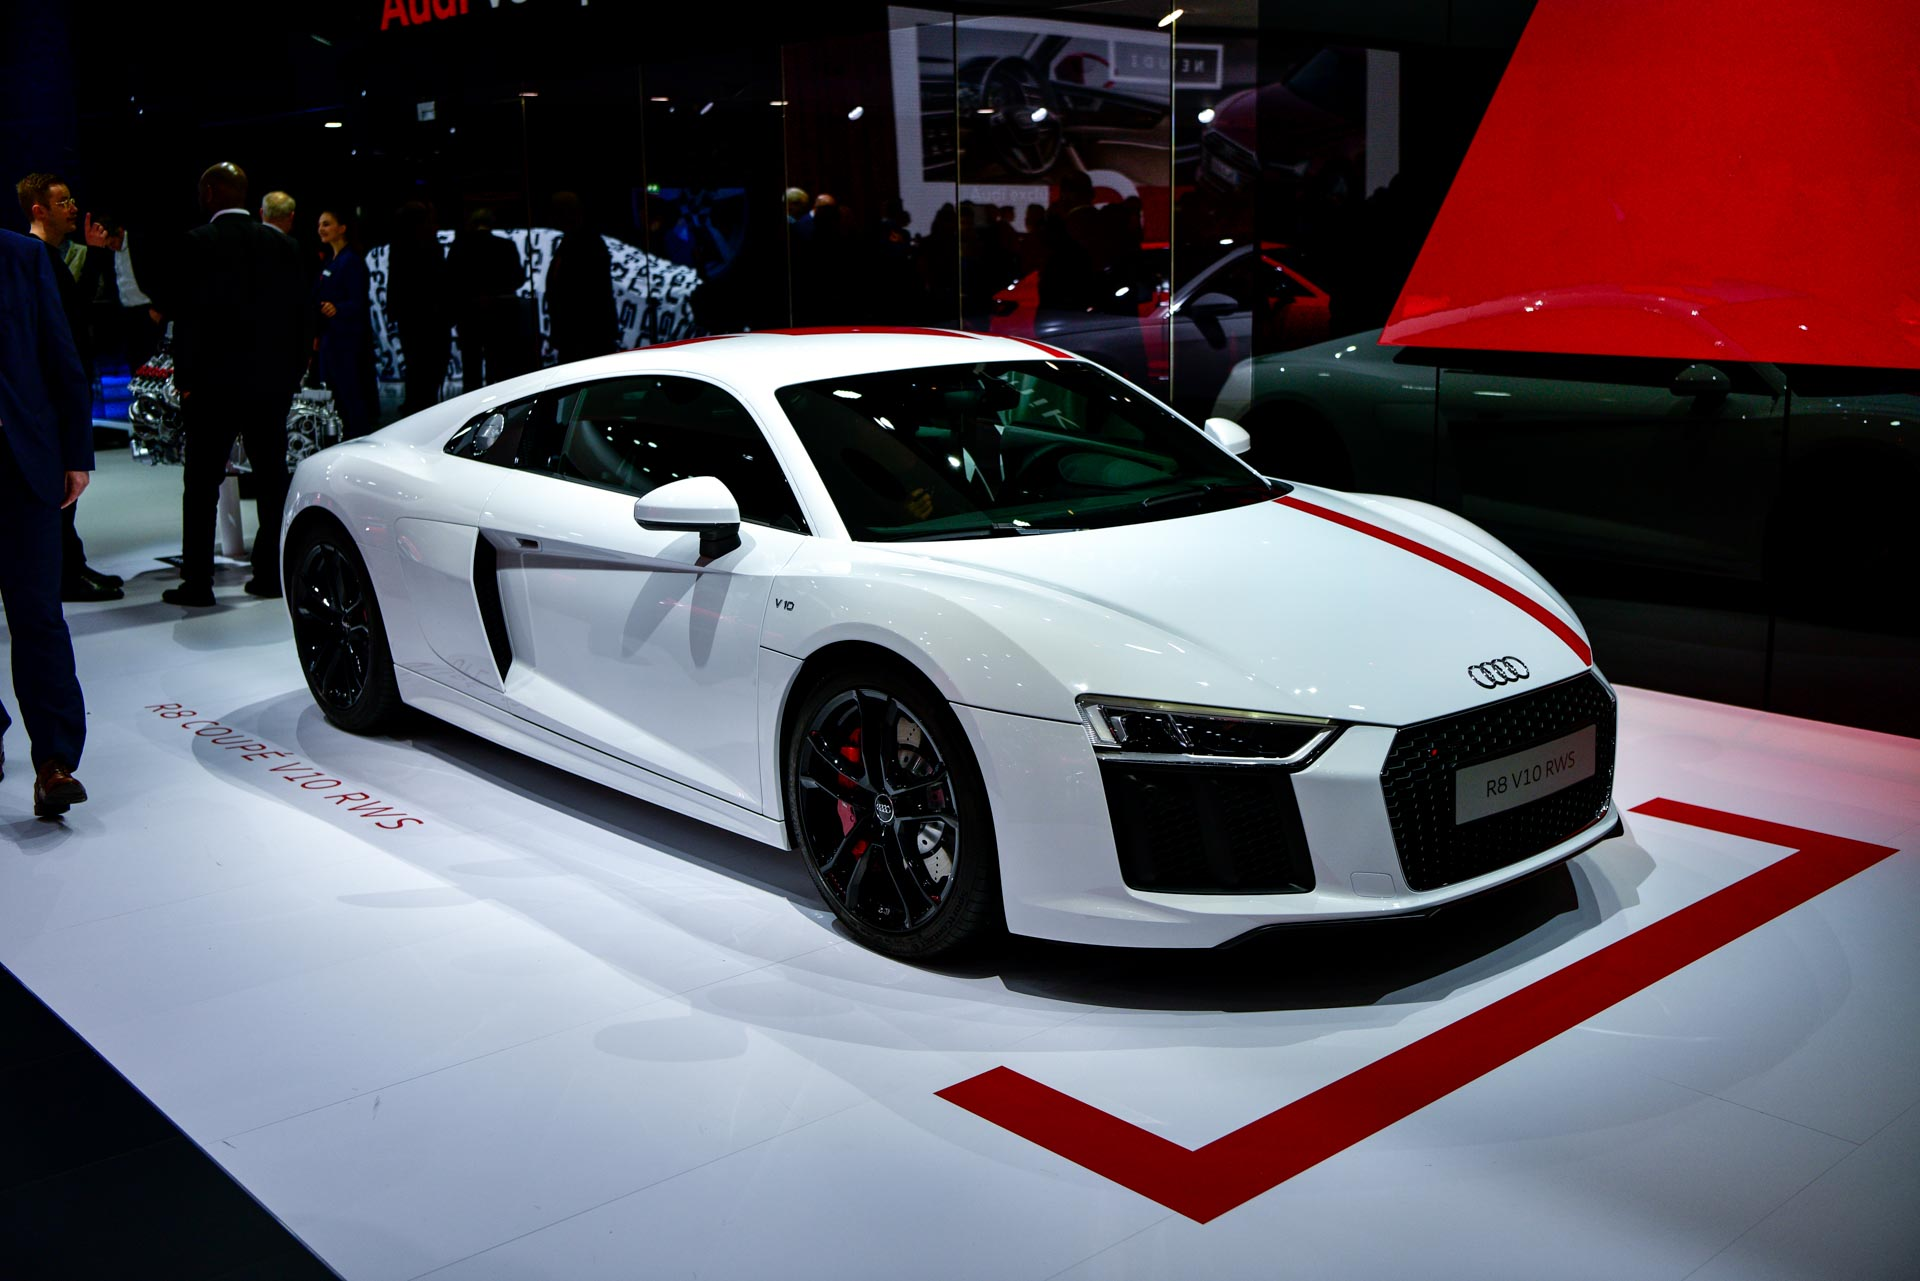 Geneva car show 2018 - Geneva car show ...